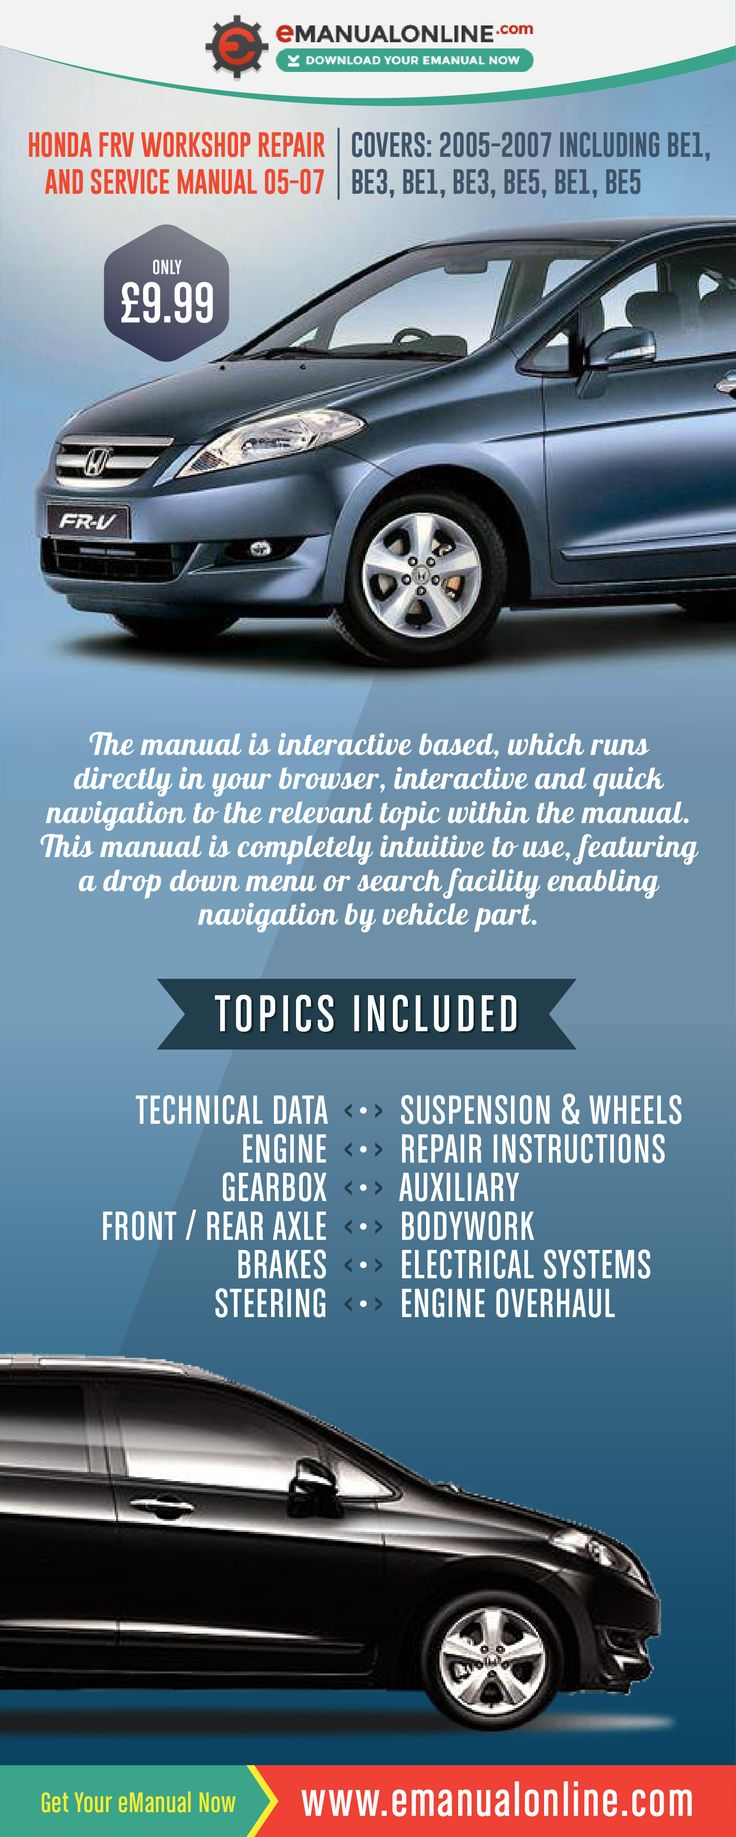 Honda frv workshop repair and service manual 05 07 this workshop manual really is